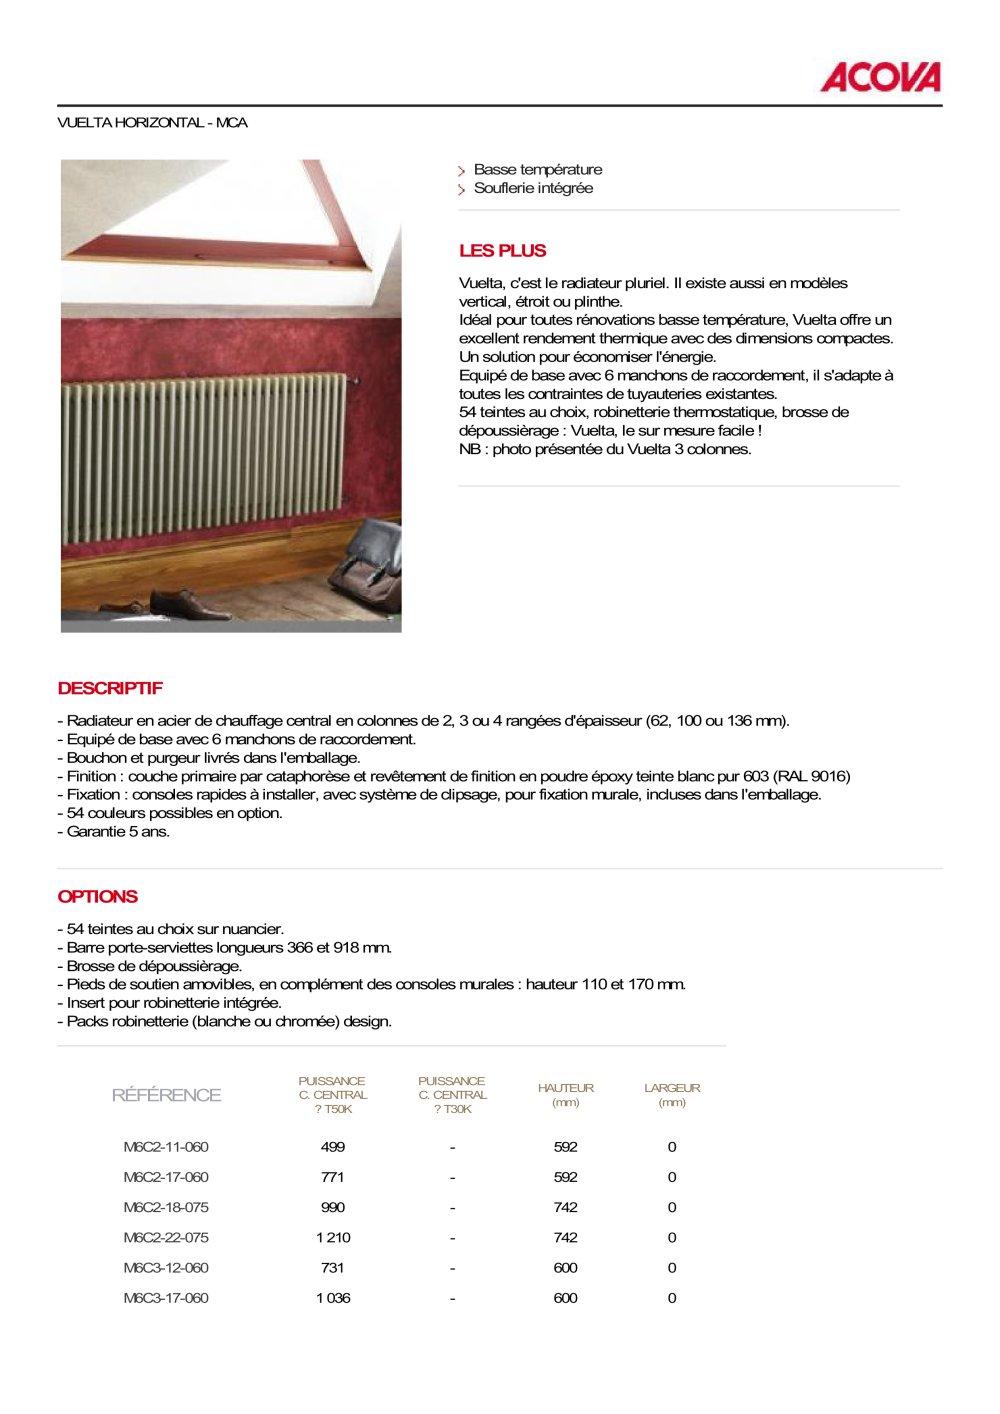 Acova Garantie intérieur vuelta horizontal - acova - catalogue pdf | documentation | brochure